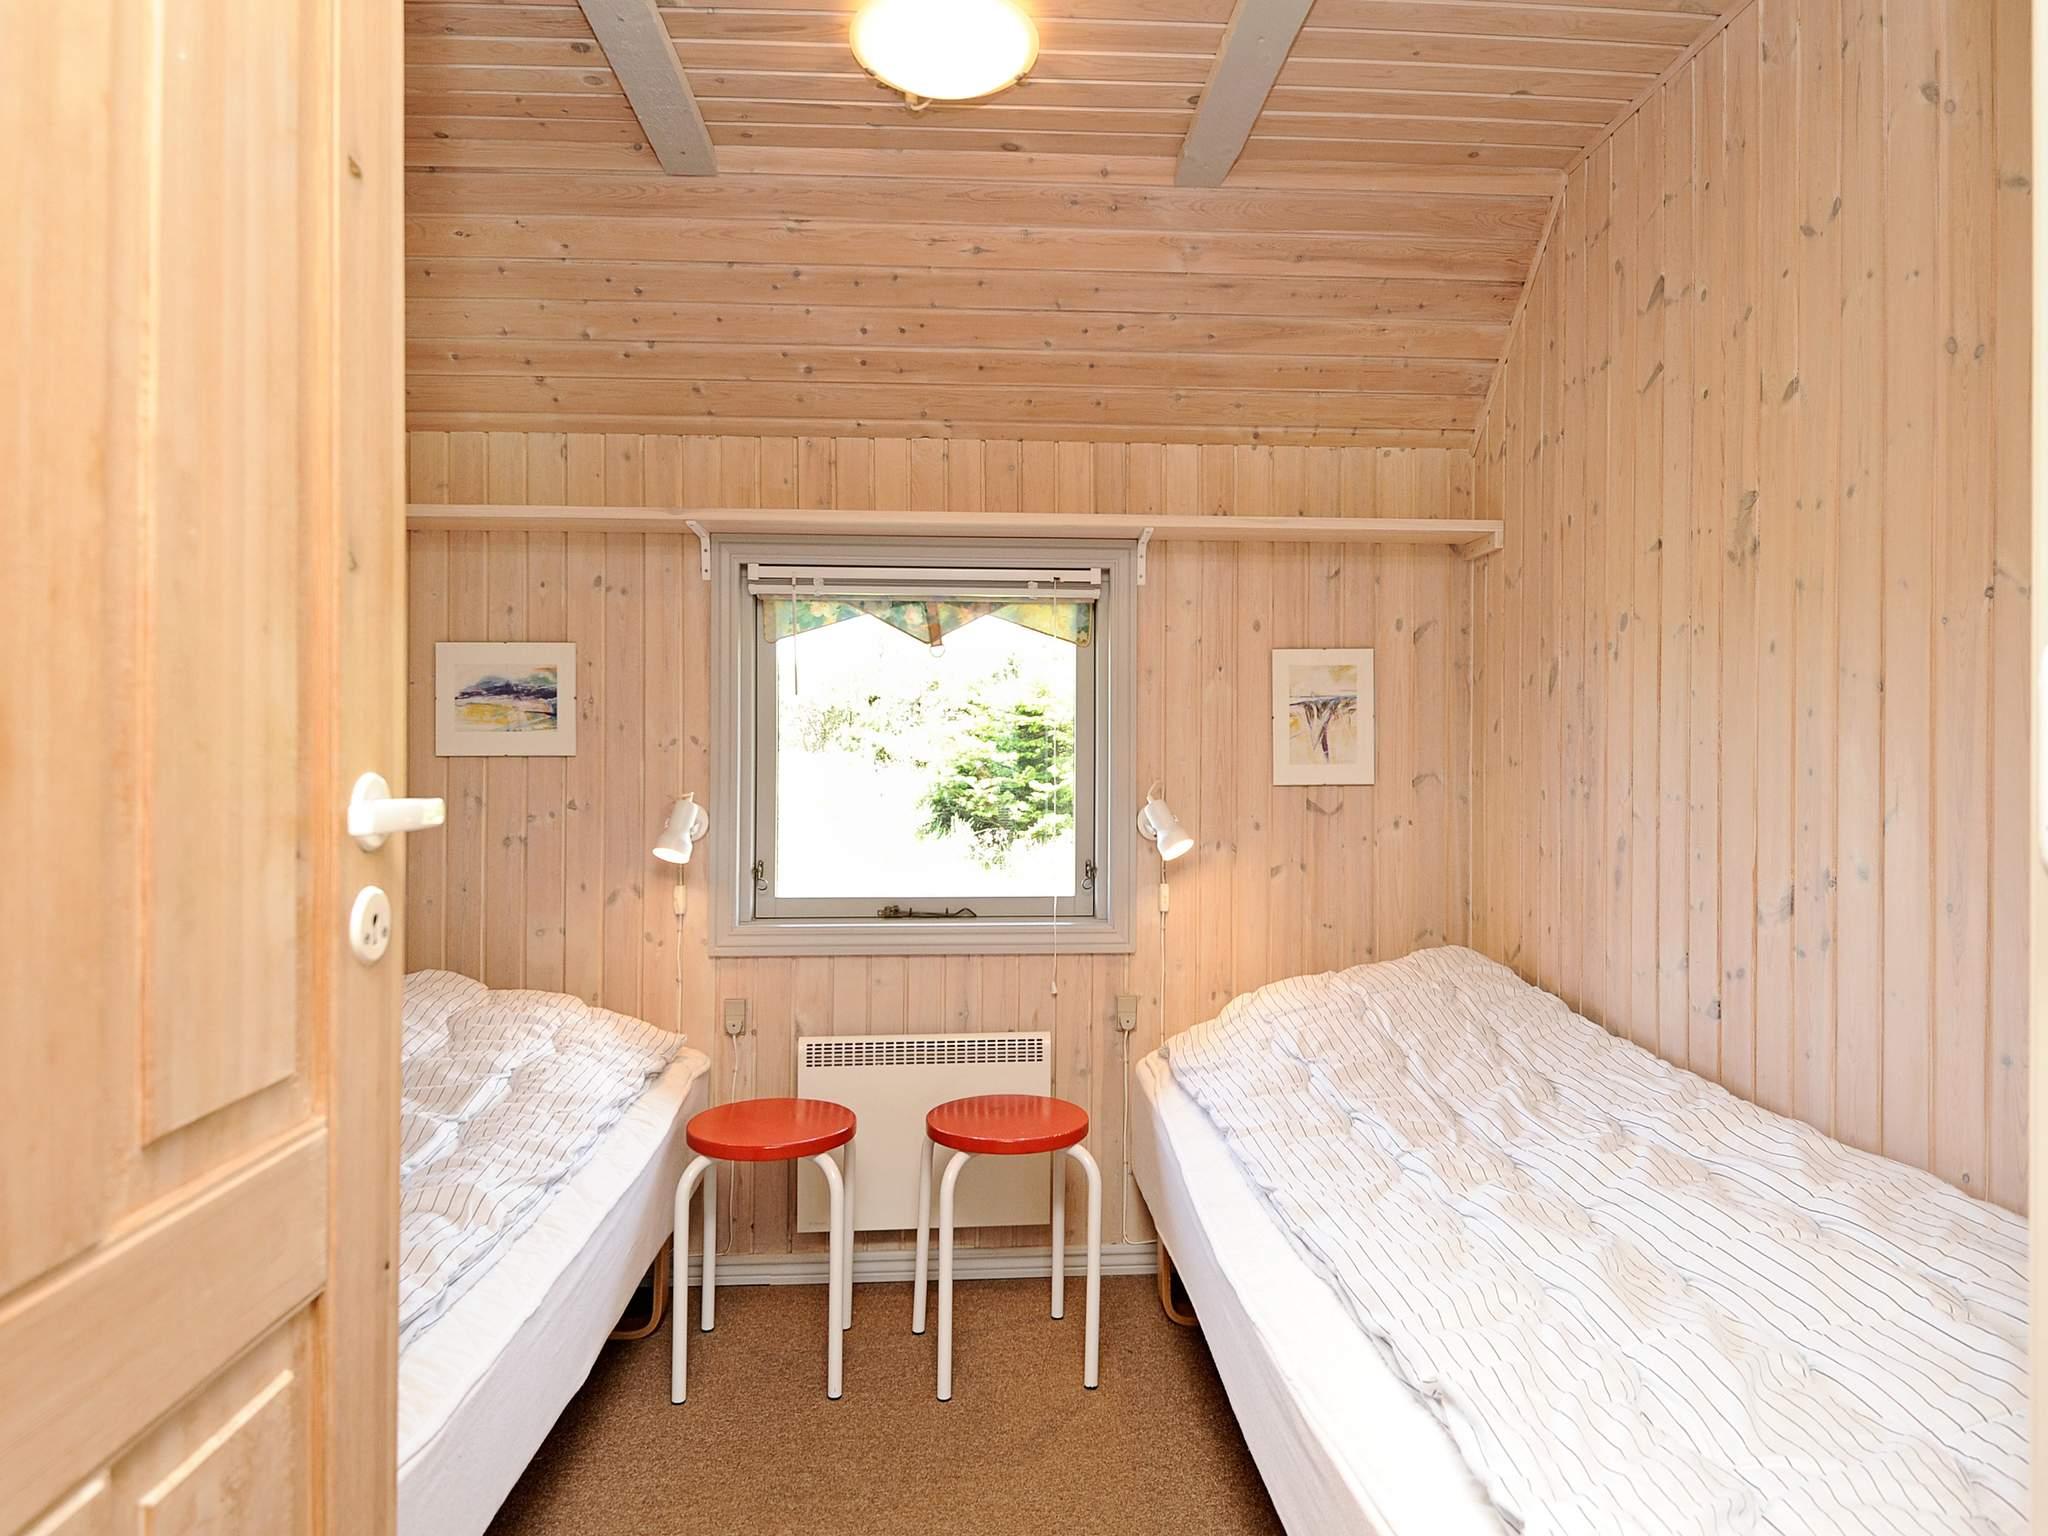 Ferienhaus Blåvand (88476), Blåvand, , Westjütland, Dänemark, Bild 10